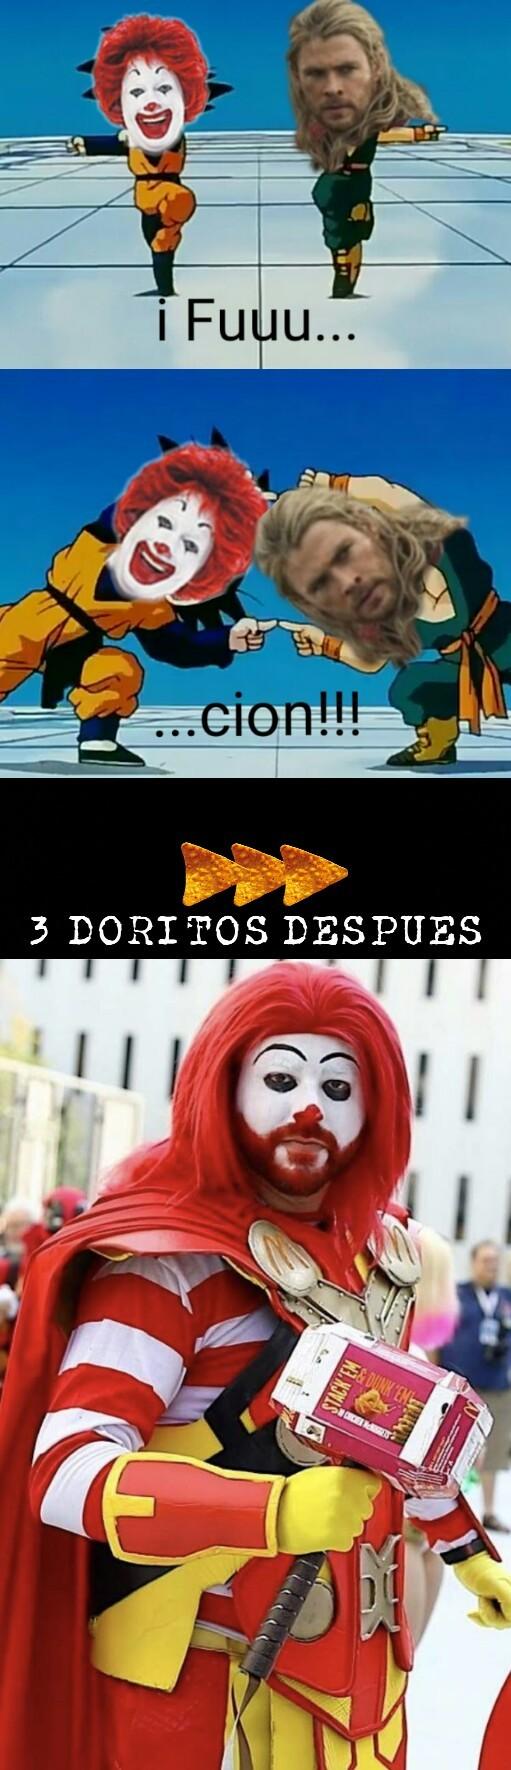 MC Vengadores - meme